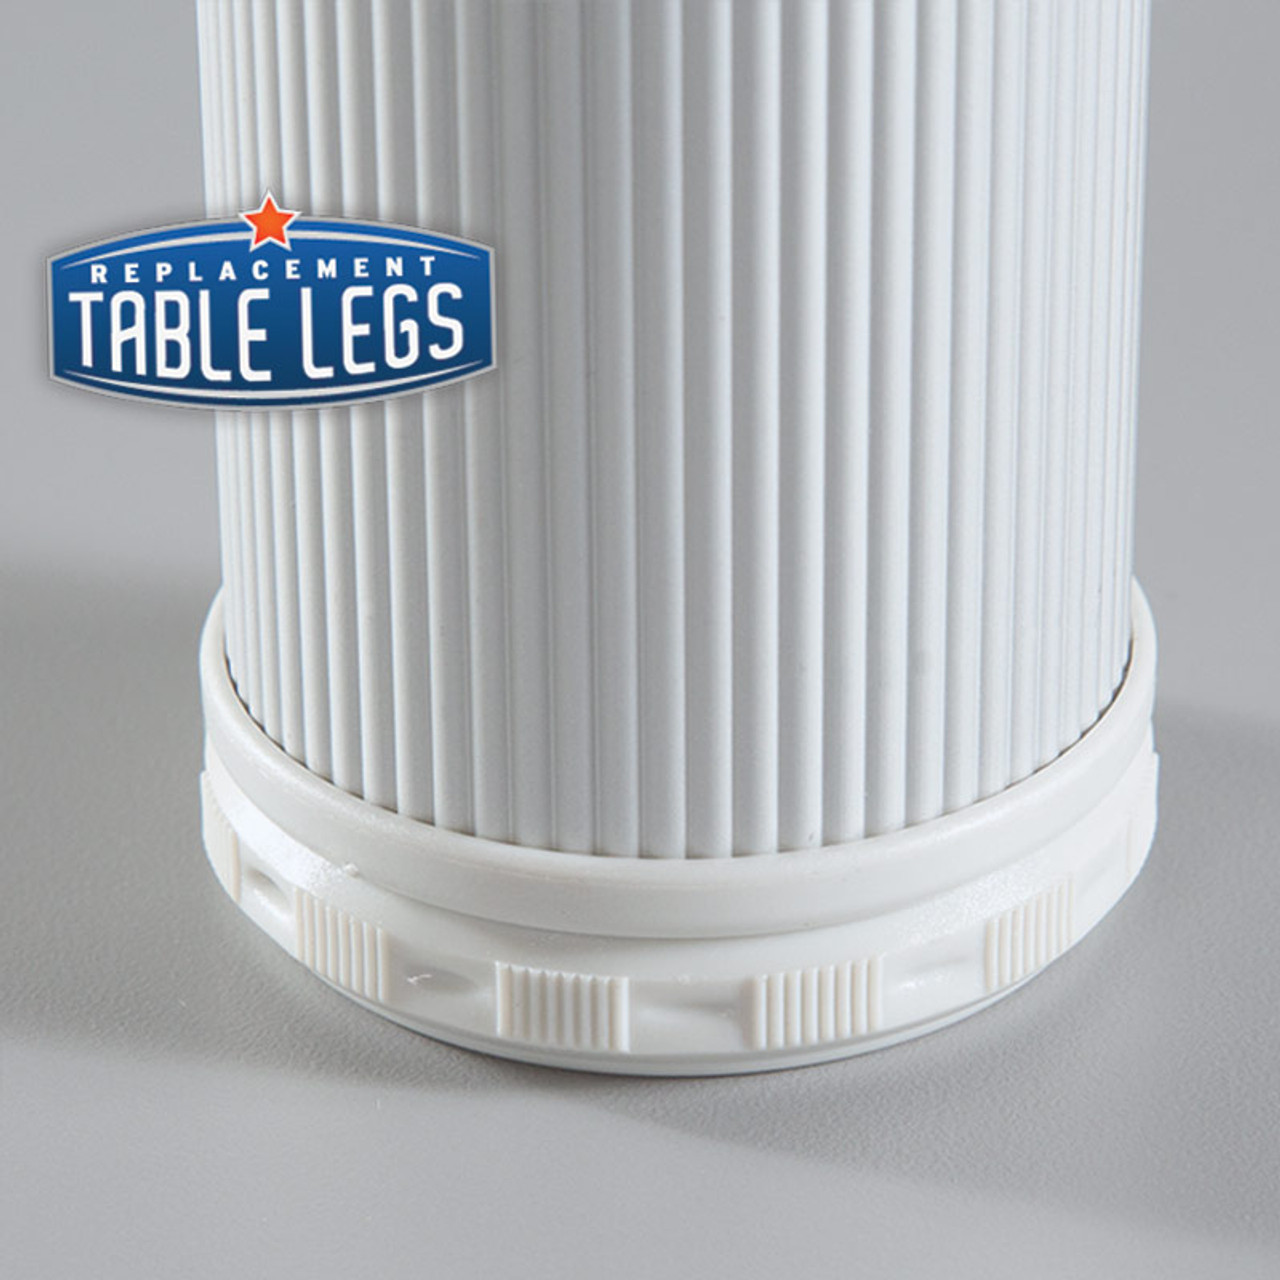 Alumina Como Leg, Cabinet Leg,  2'' diameter, 1-1/8'' adjustable foot close up - replacementtablelegs.com